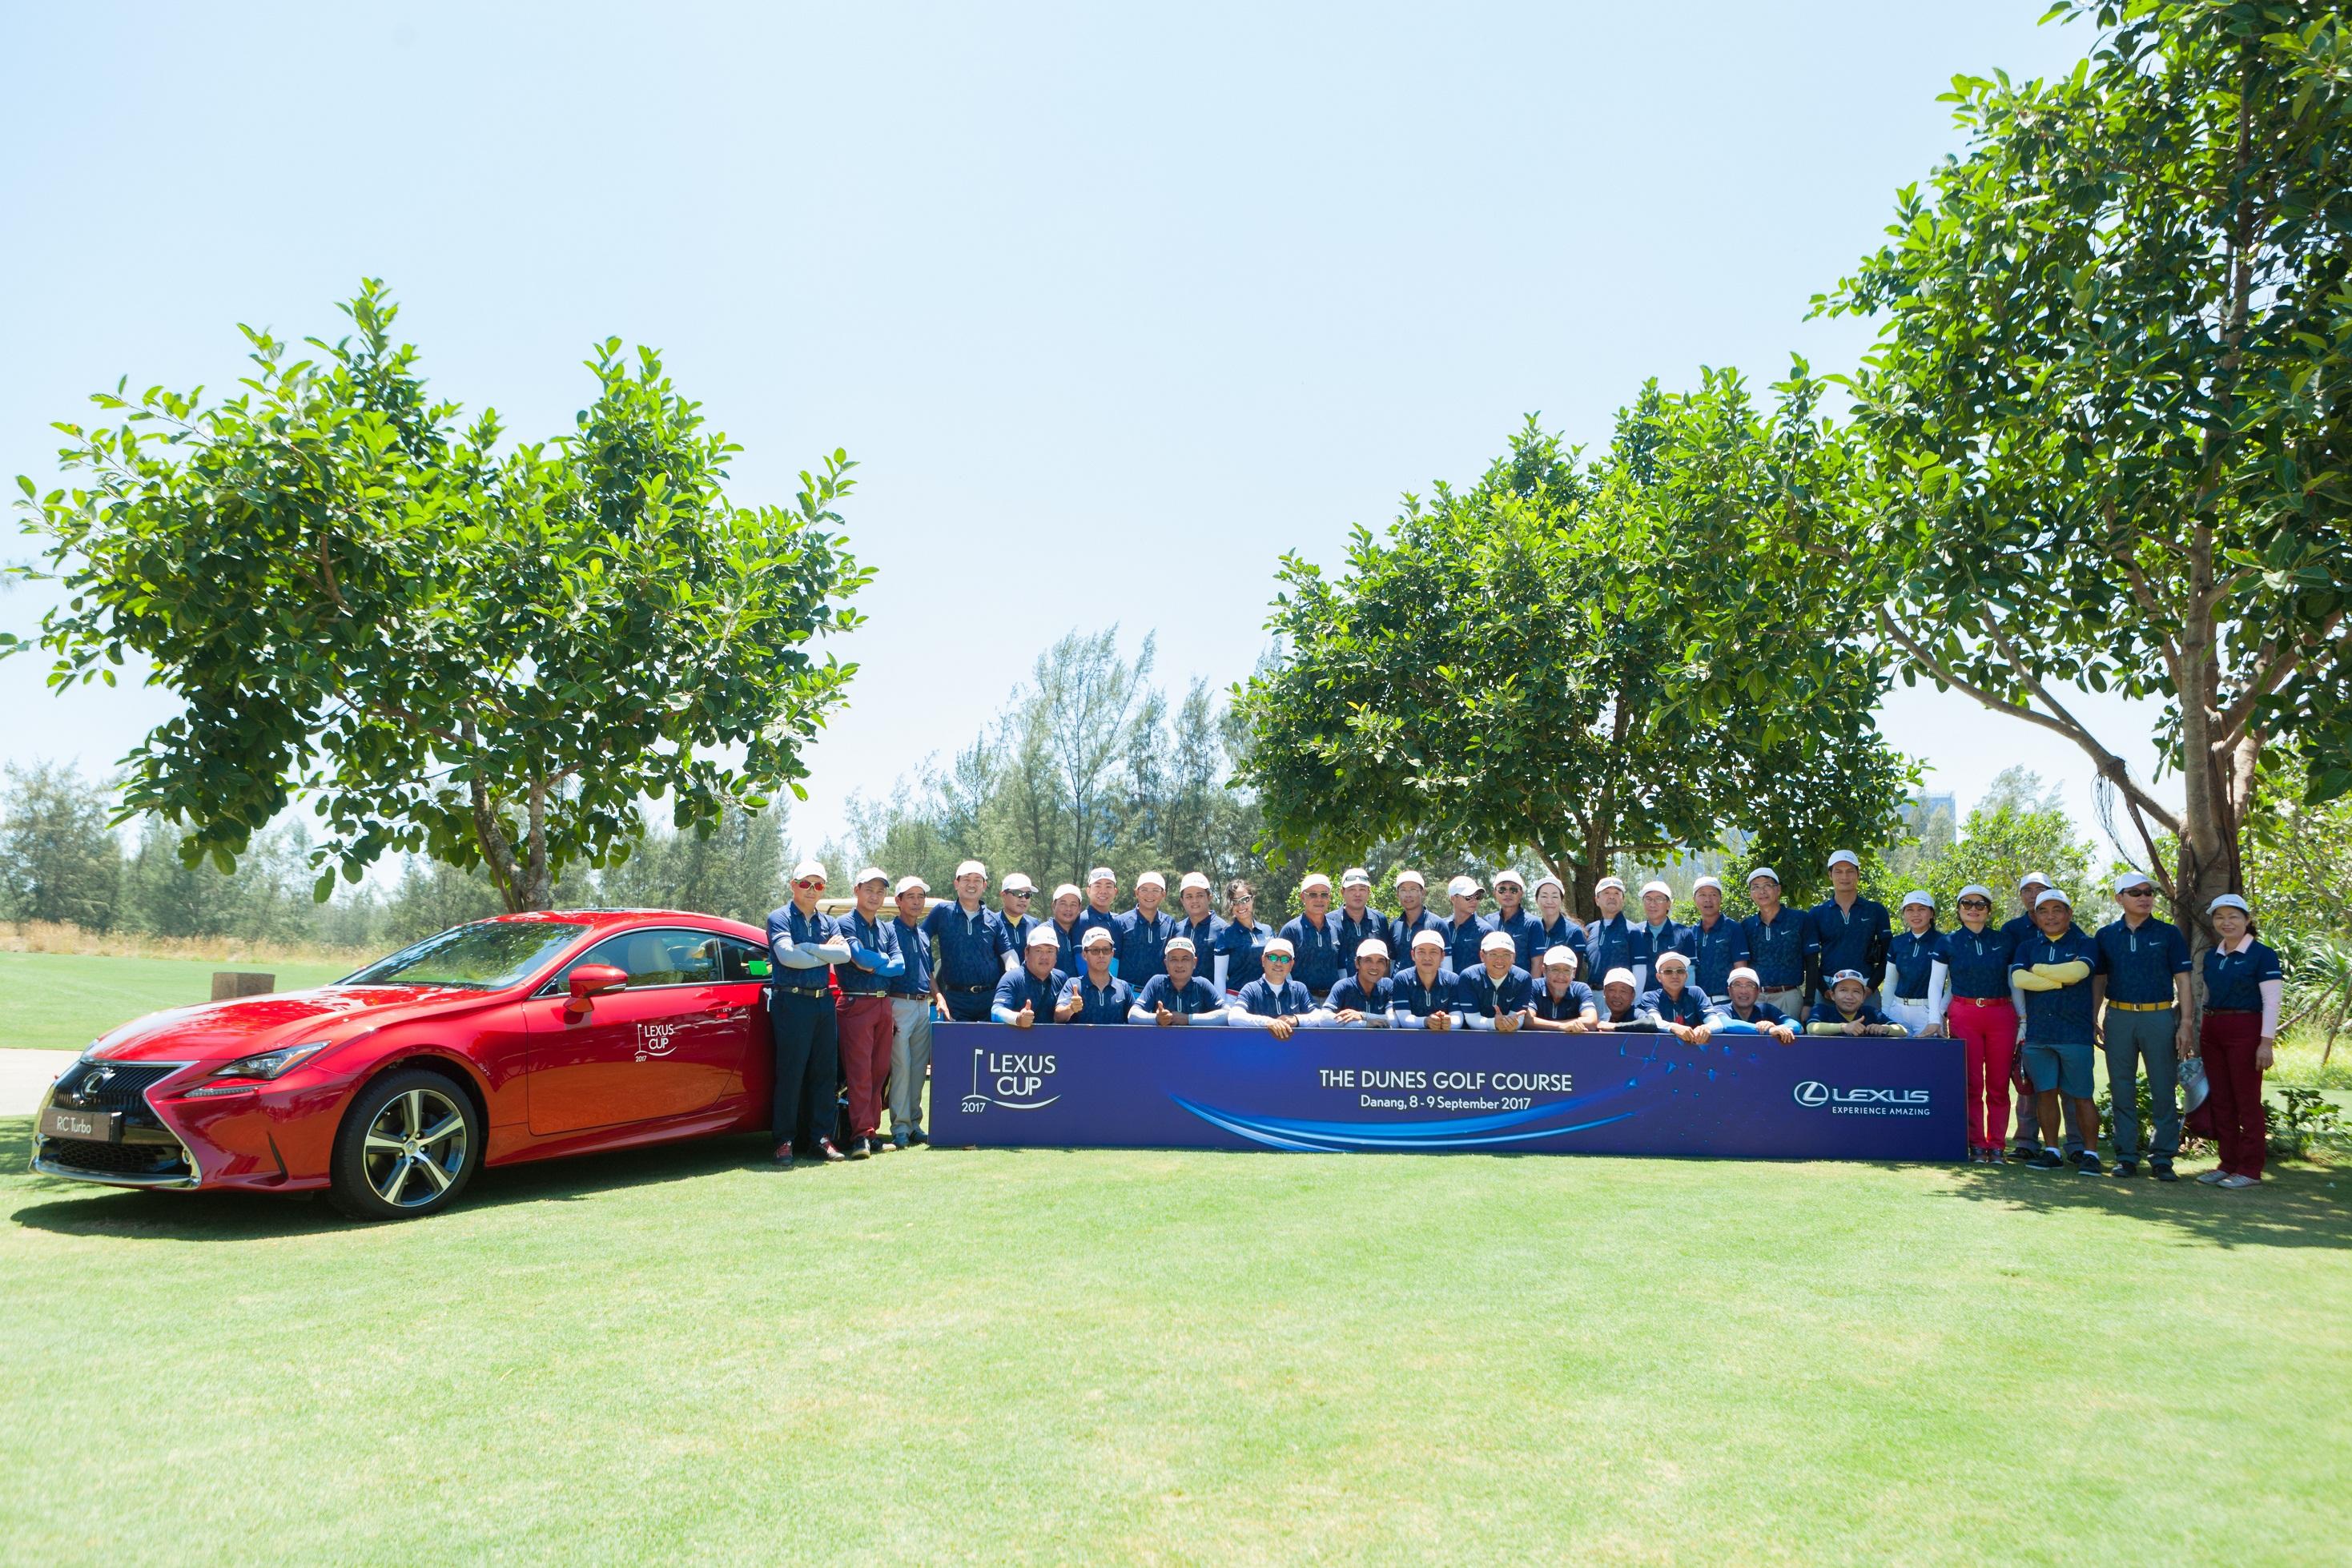 cac-golf-th_-tham-gia-vong-chung-k_t